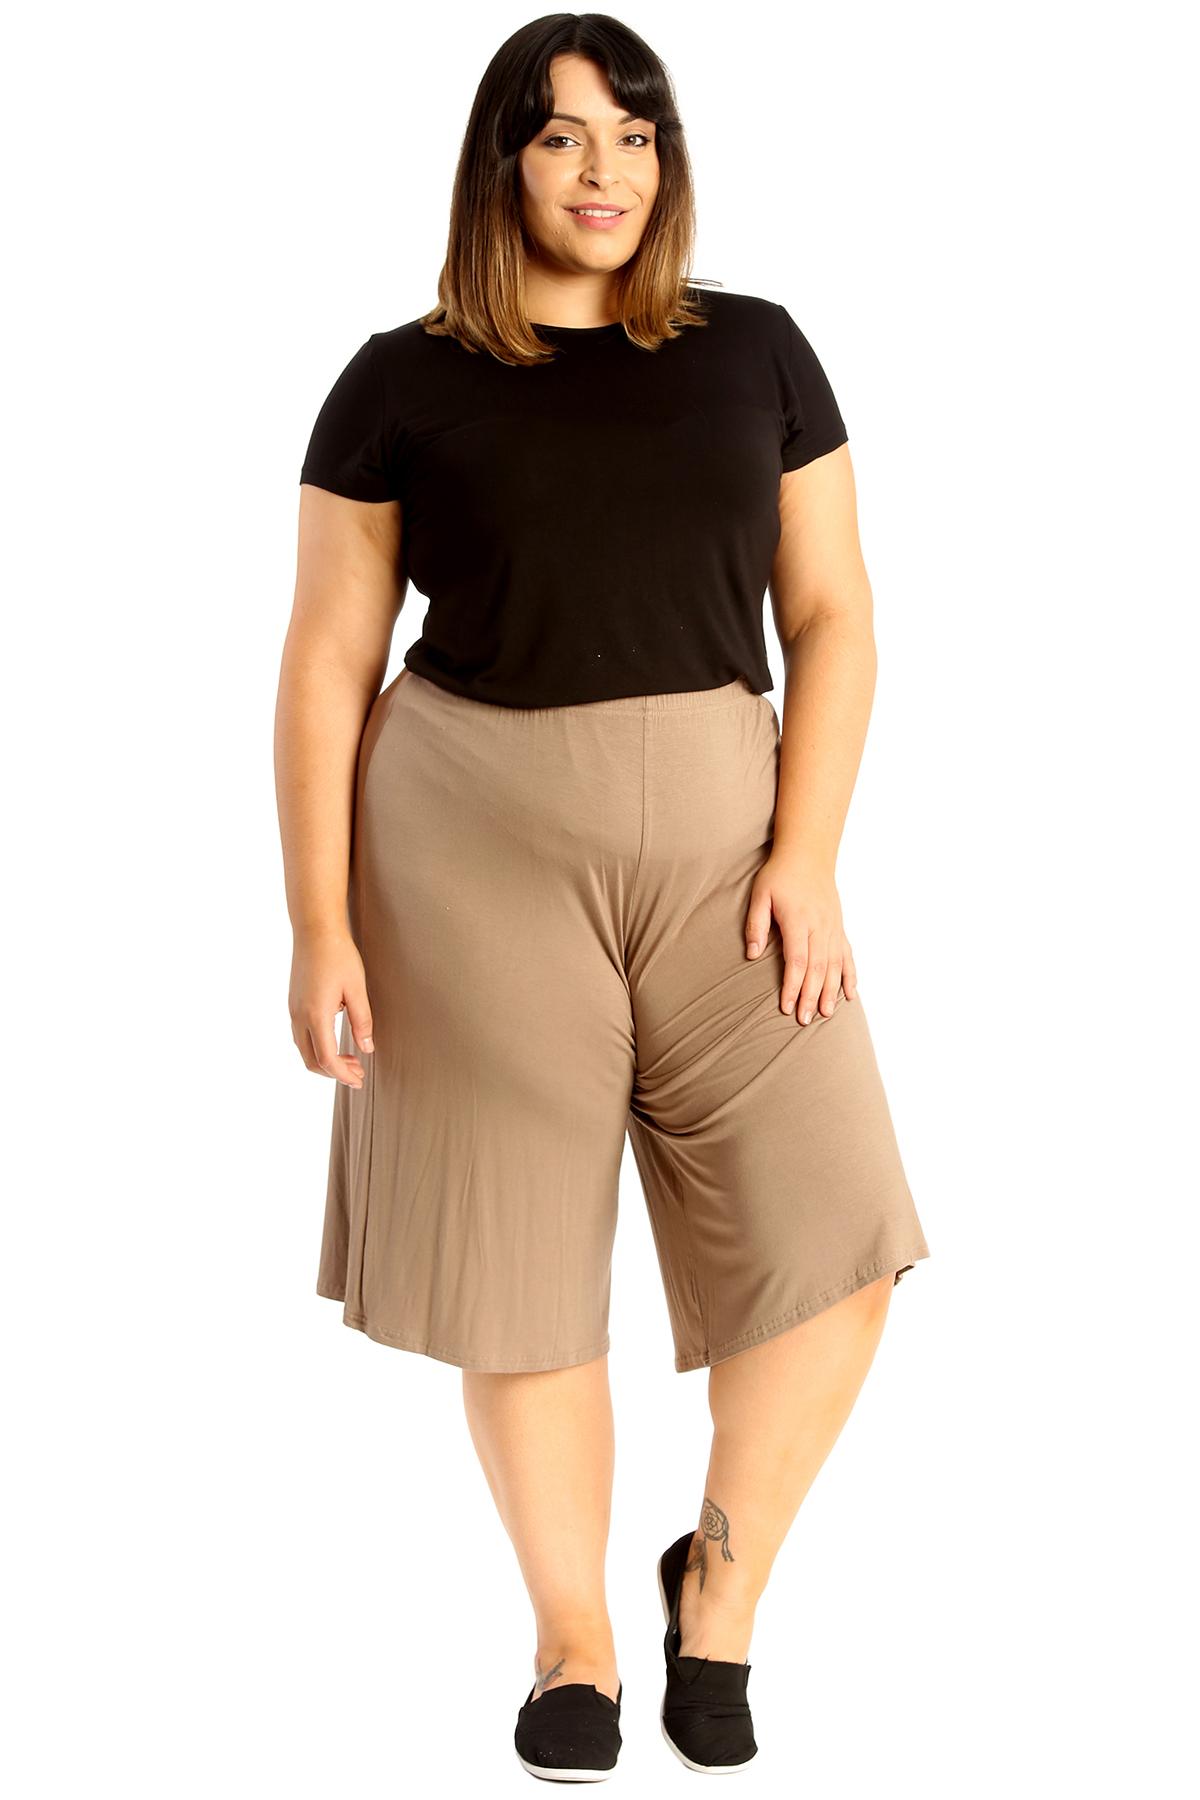 New-Womens-Plus-Size-Culottes-Ladies-Plain-Shorts-Palazzo-Elastic-Pants-Summer thumbnail 26